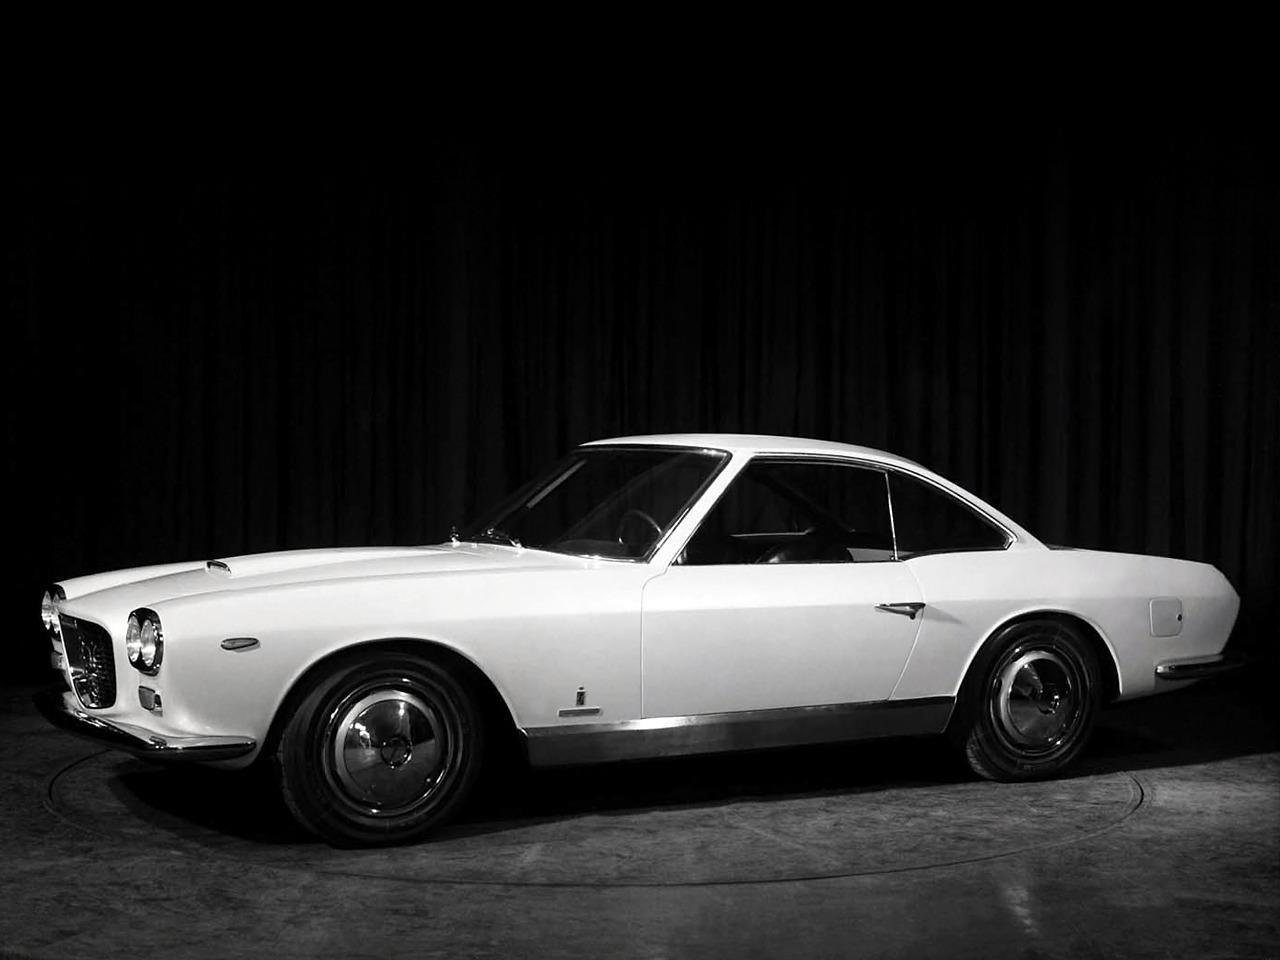 Saab Dealer Near Me >> Lancia Flaminia Speciale 3C (826) (1963) - Old Concept Cars